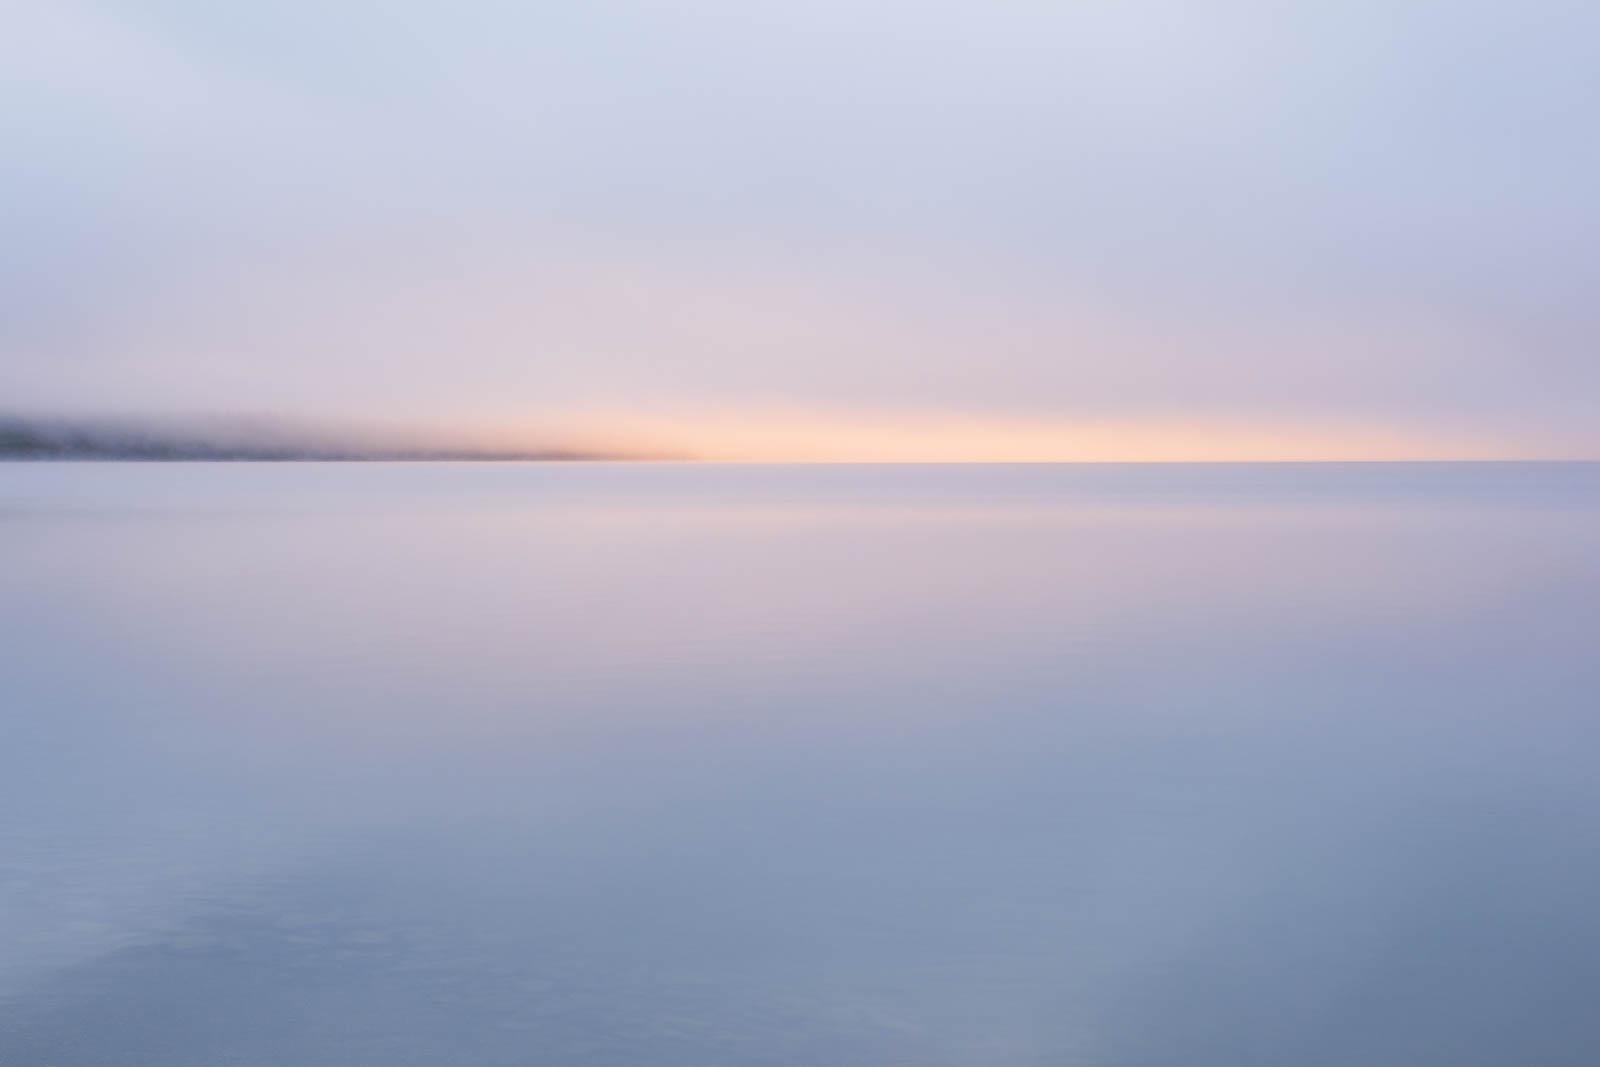 Lake, Wyoming, blue, landscape orientation, long exposure, orange, pastel, peaceful, yellowstone national park, ynp, rocky mountains...